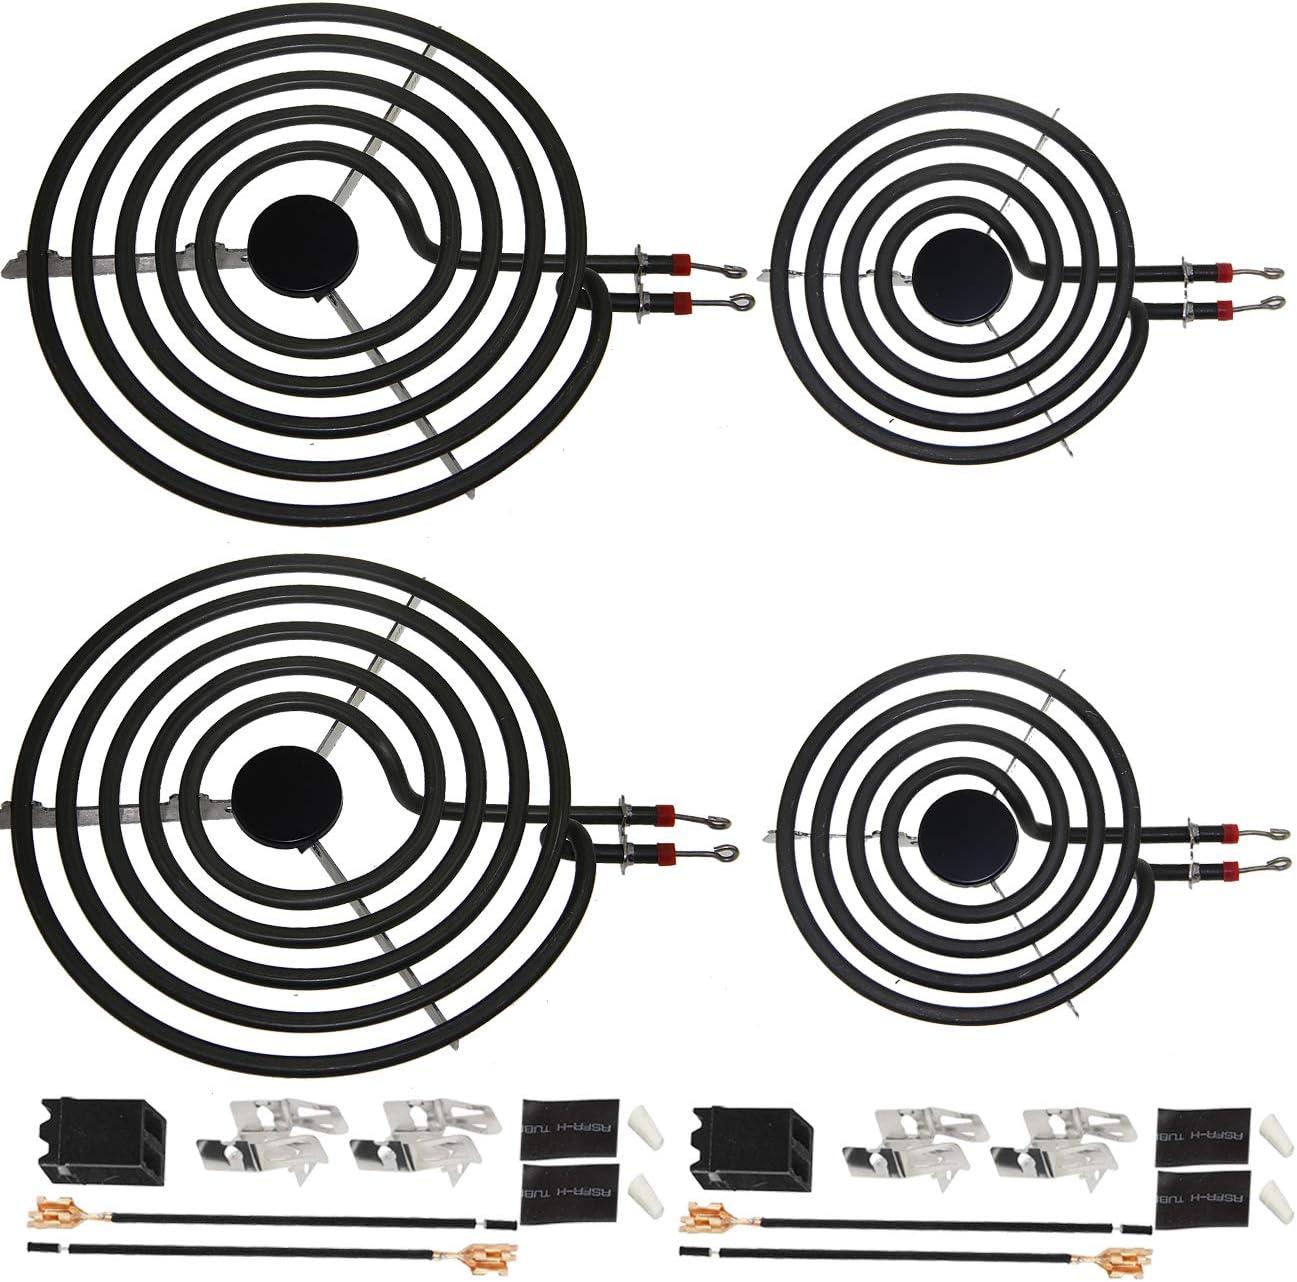 "MP22YA For Hardwick & Jenn Air & Kenmore & Norge & Whirlpool Electric Range Stove 6 Pack Electric Range Burner Element Unit Set - 2 MP15YA 6"" and 2 MP21YA 8""and 2 330031 Receptacle kits"